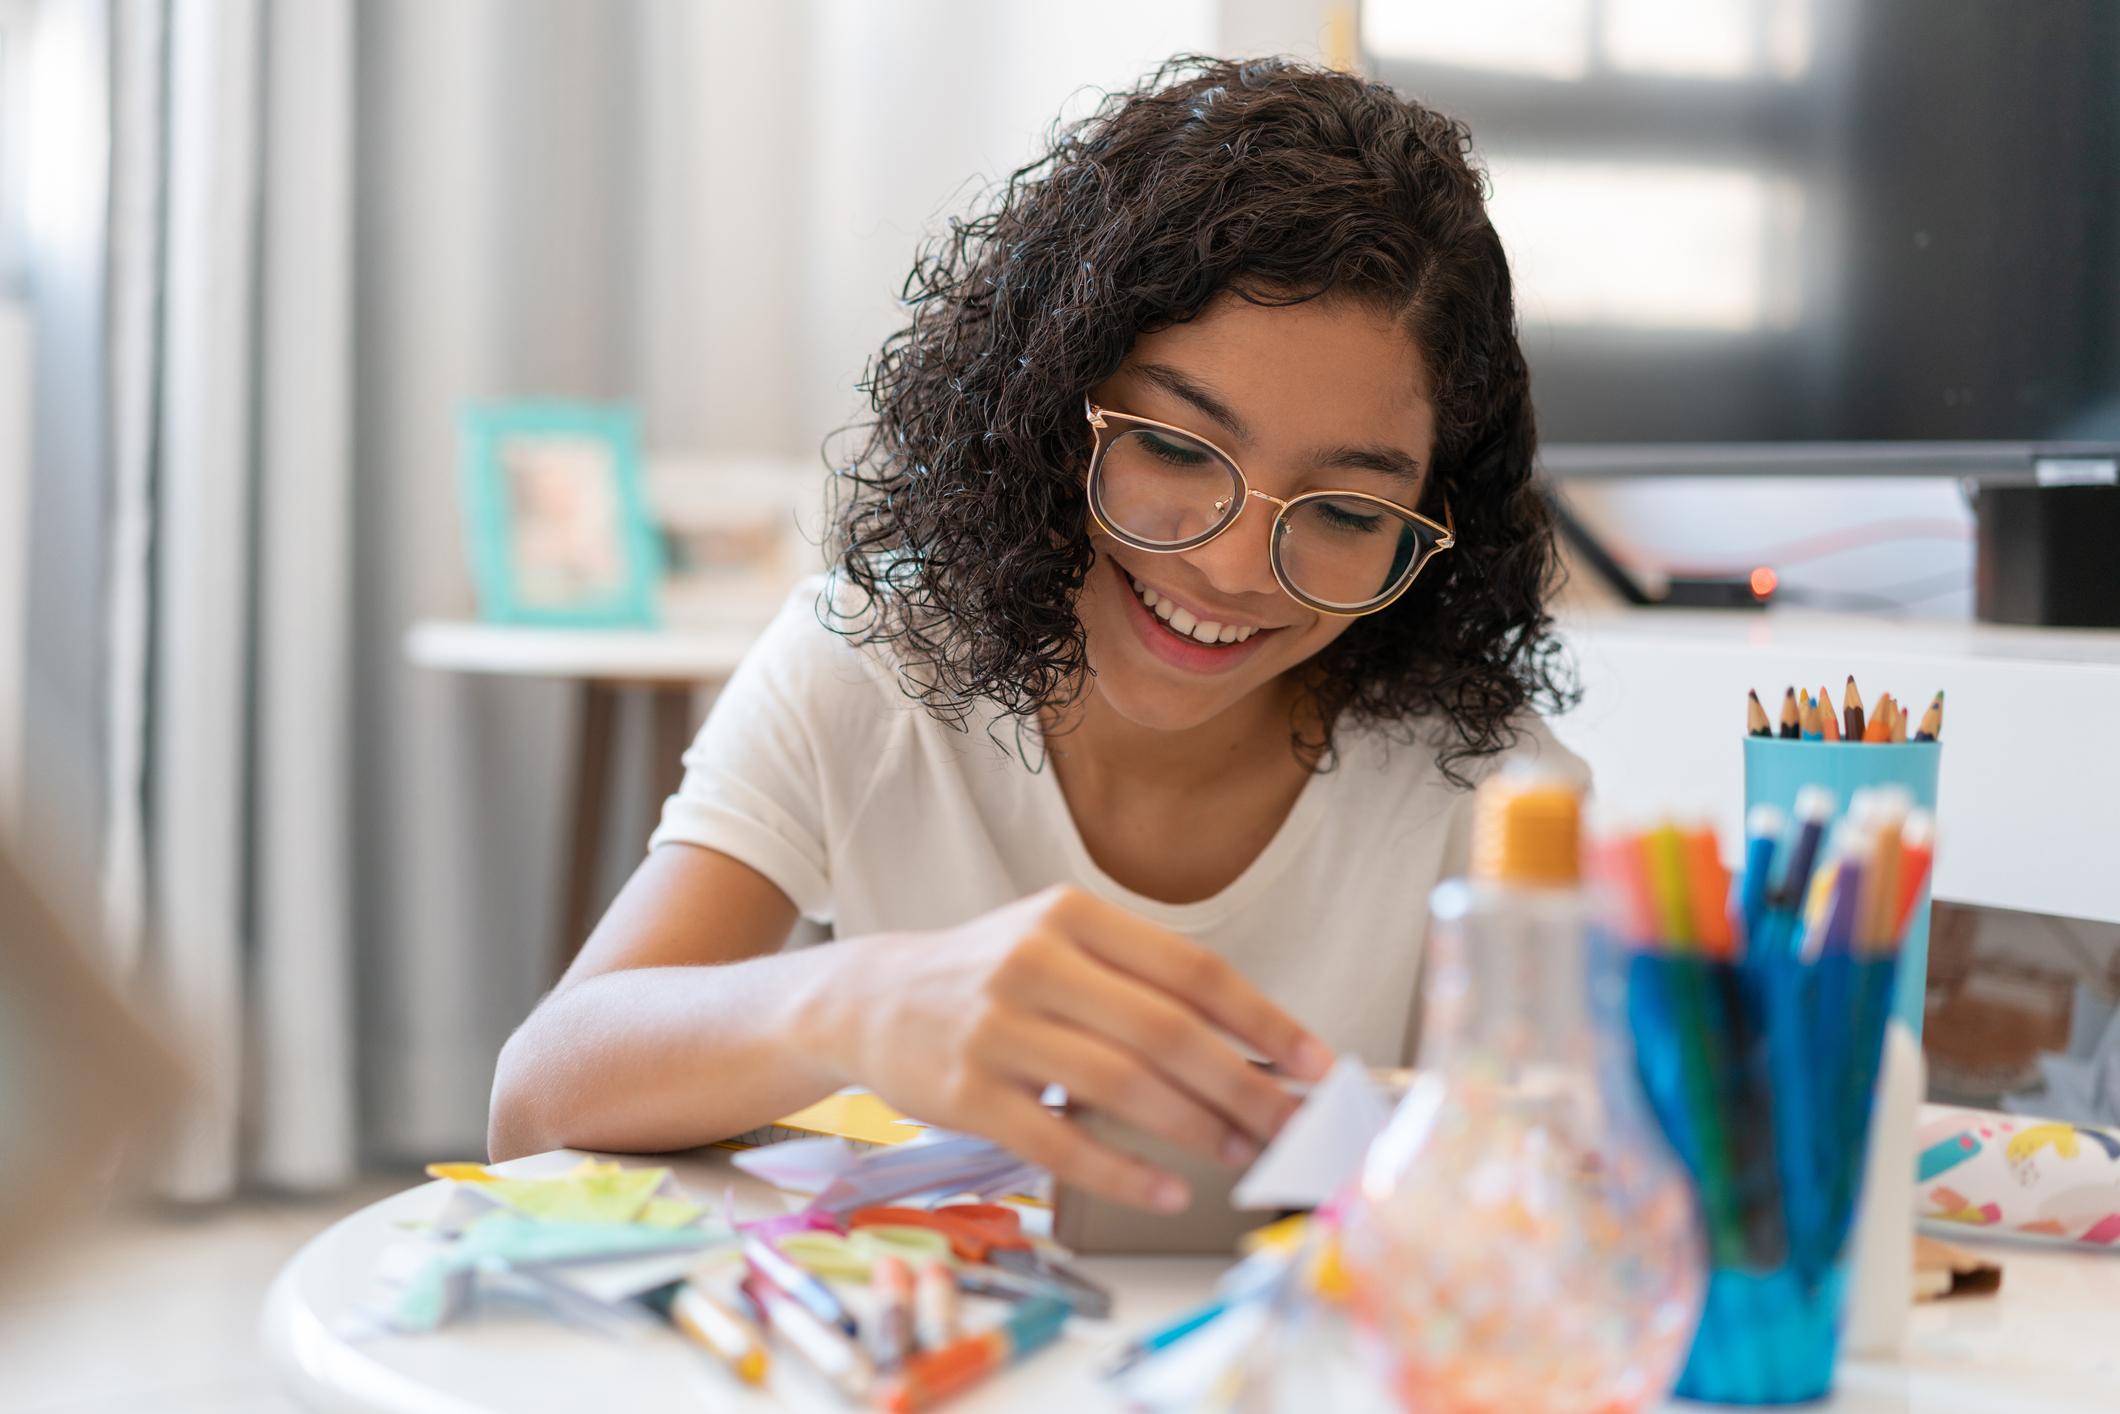 Teenage girl painting and drawing